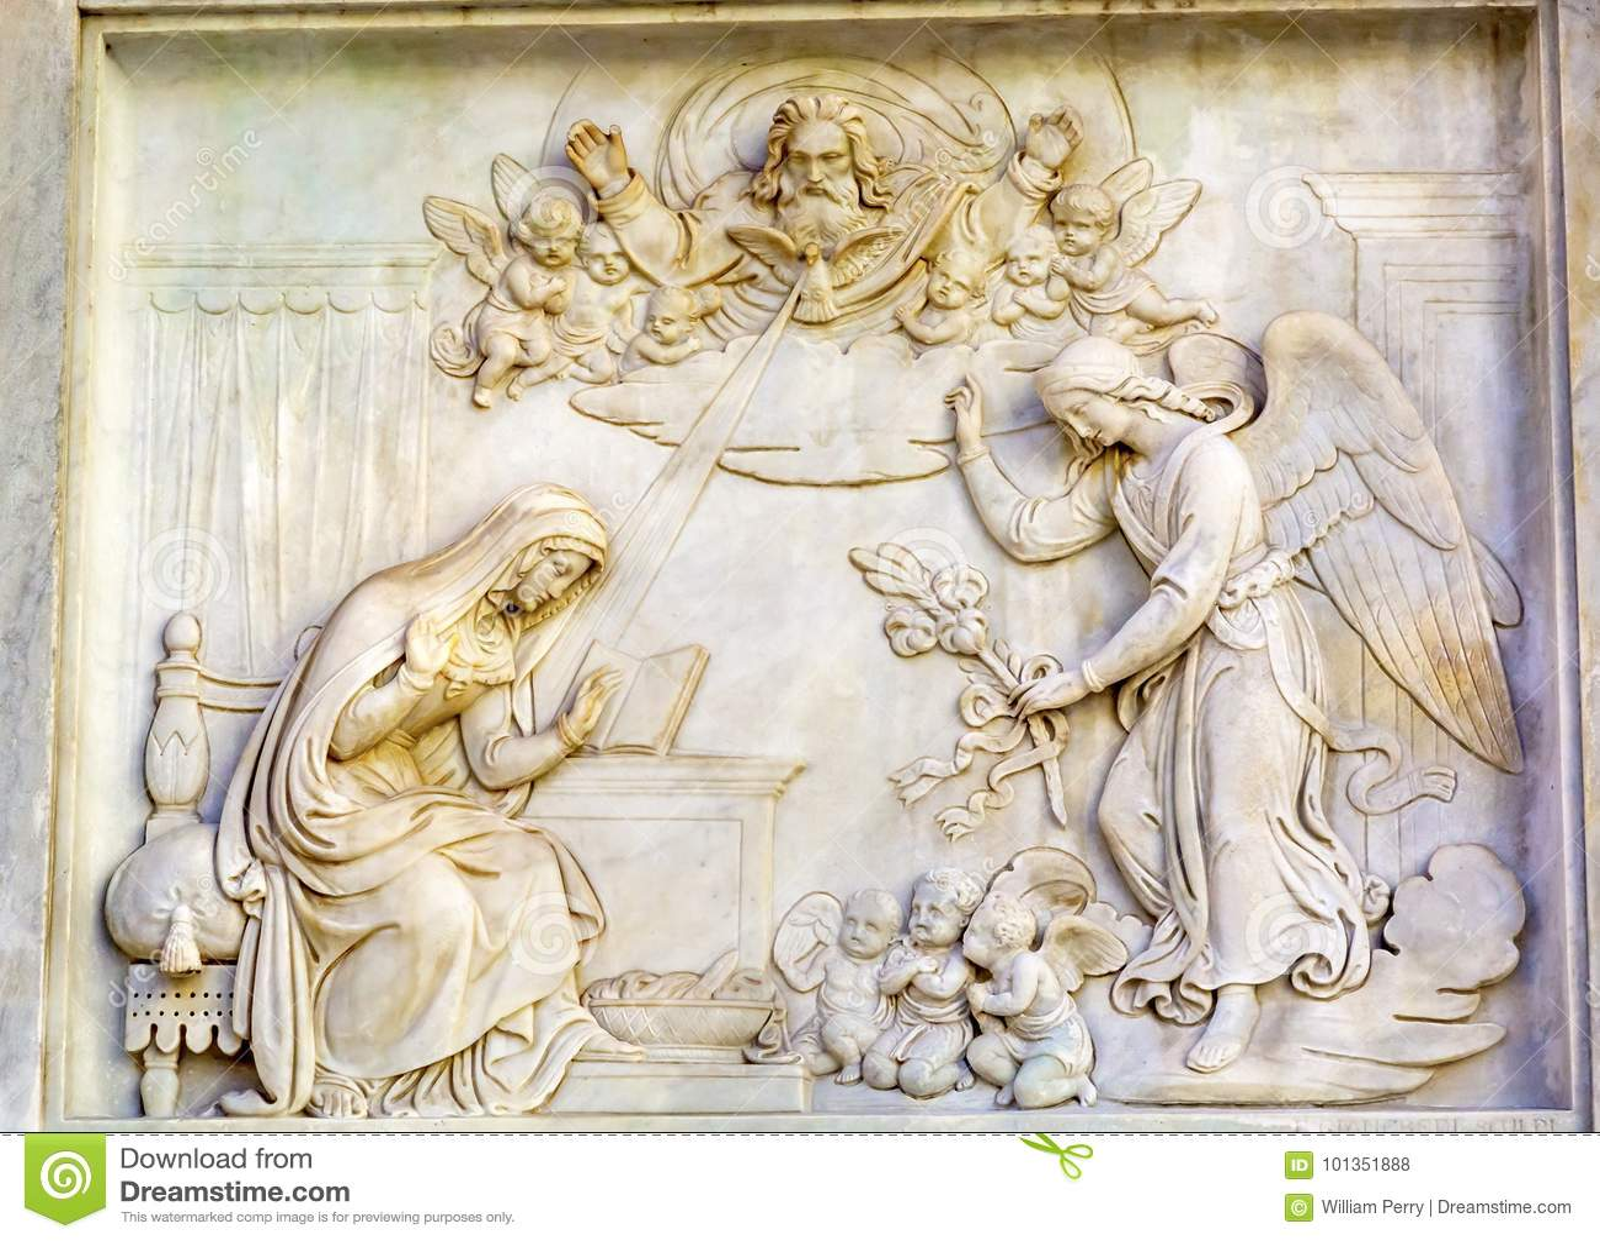 Ankündigungs-Angel Virgin Mary Statue Immaculate-Konzeption Colu